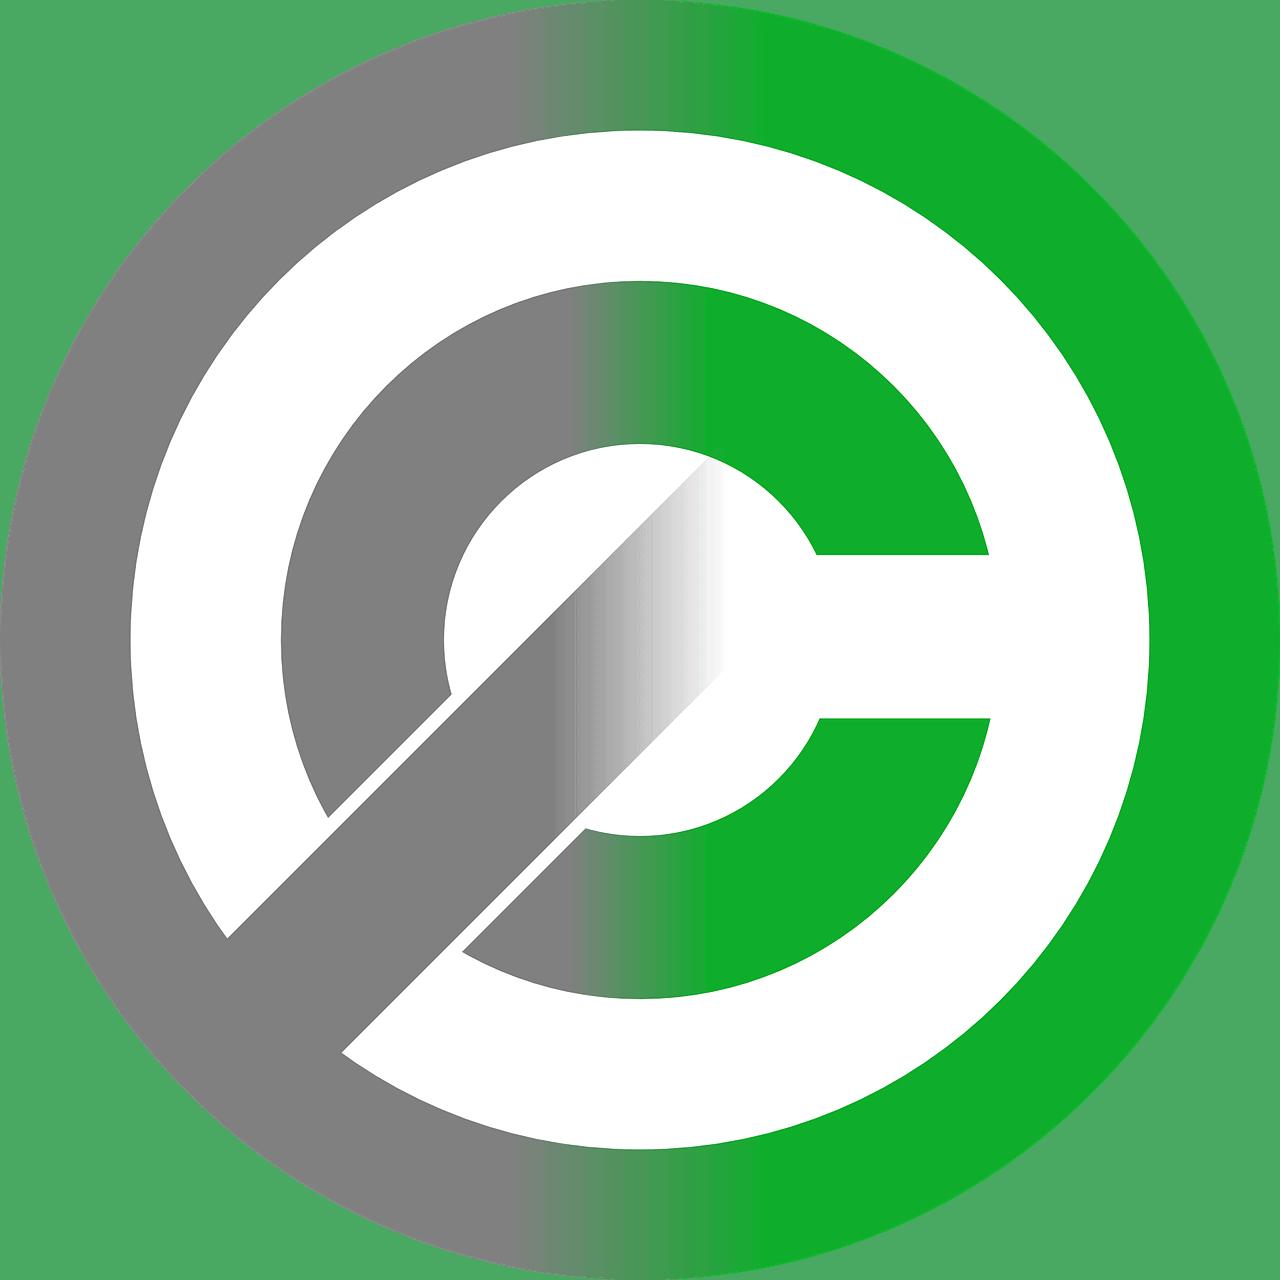 Urheberrechtsfreie Bilder